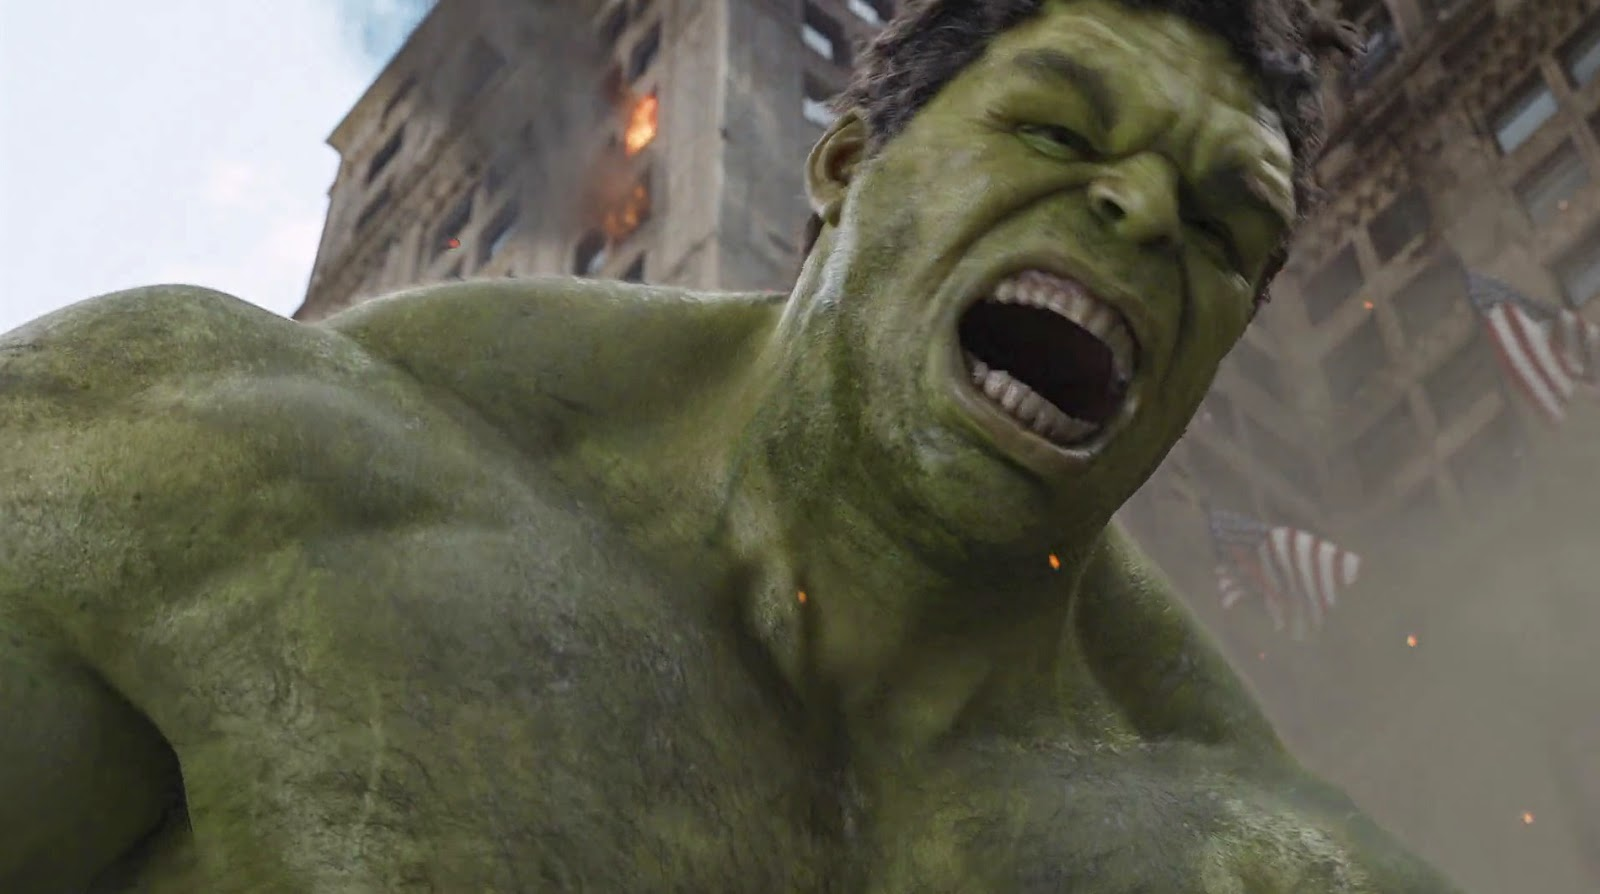 The-Incredible-Hulk-image-the-incredible-hulk-36100704-1920-1080